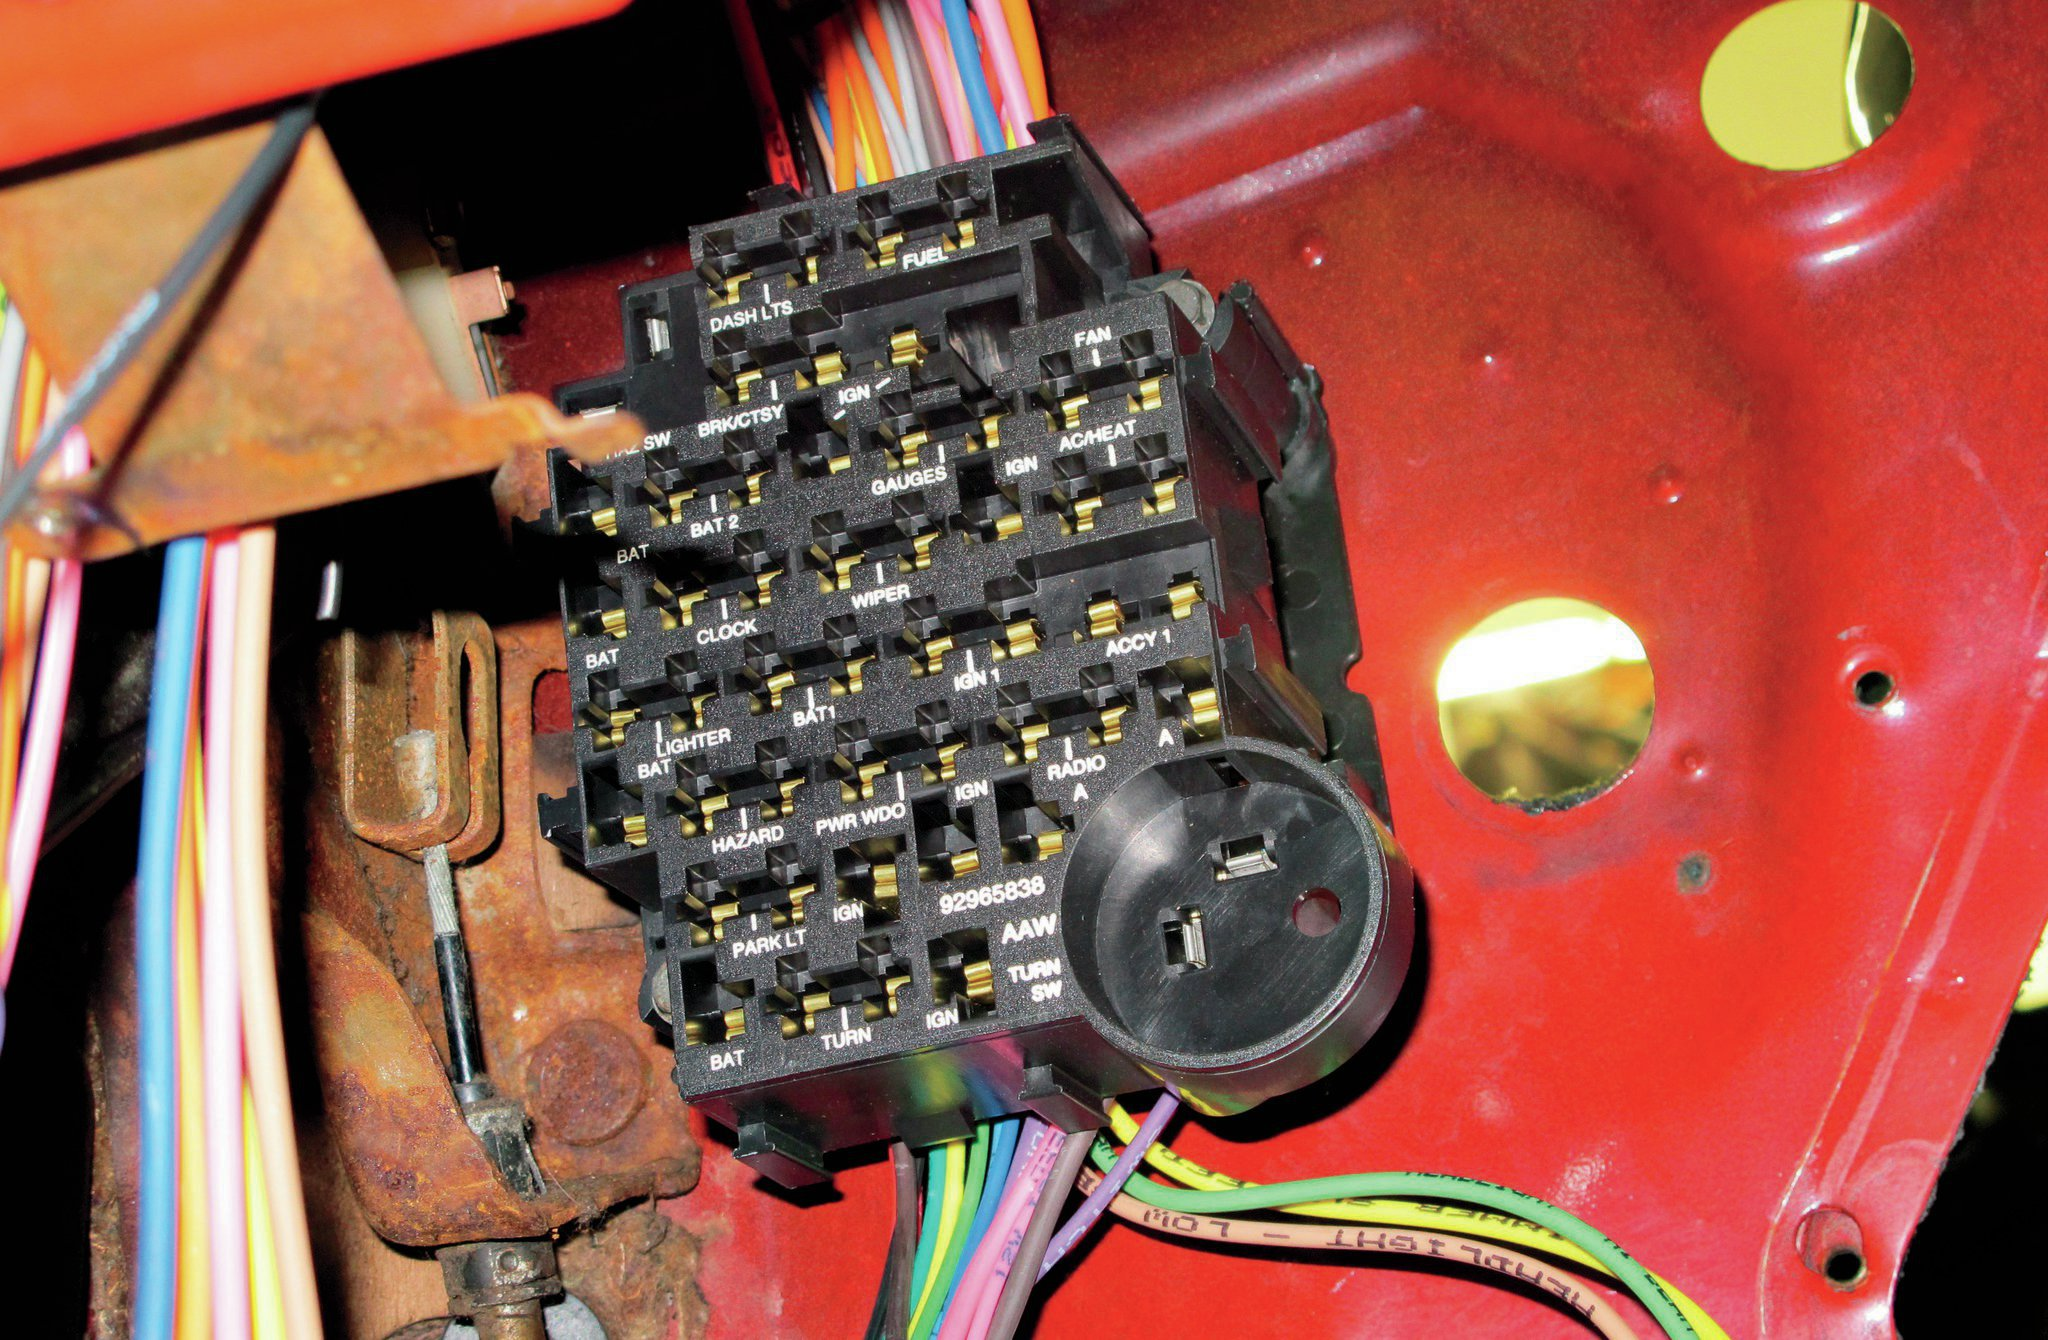 medium resolution of 70 gmc truck fuse box wiring diagram technic1970 c10 fuse box wiring diagram technic70 gmc truck